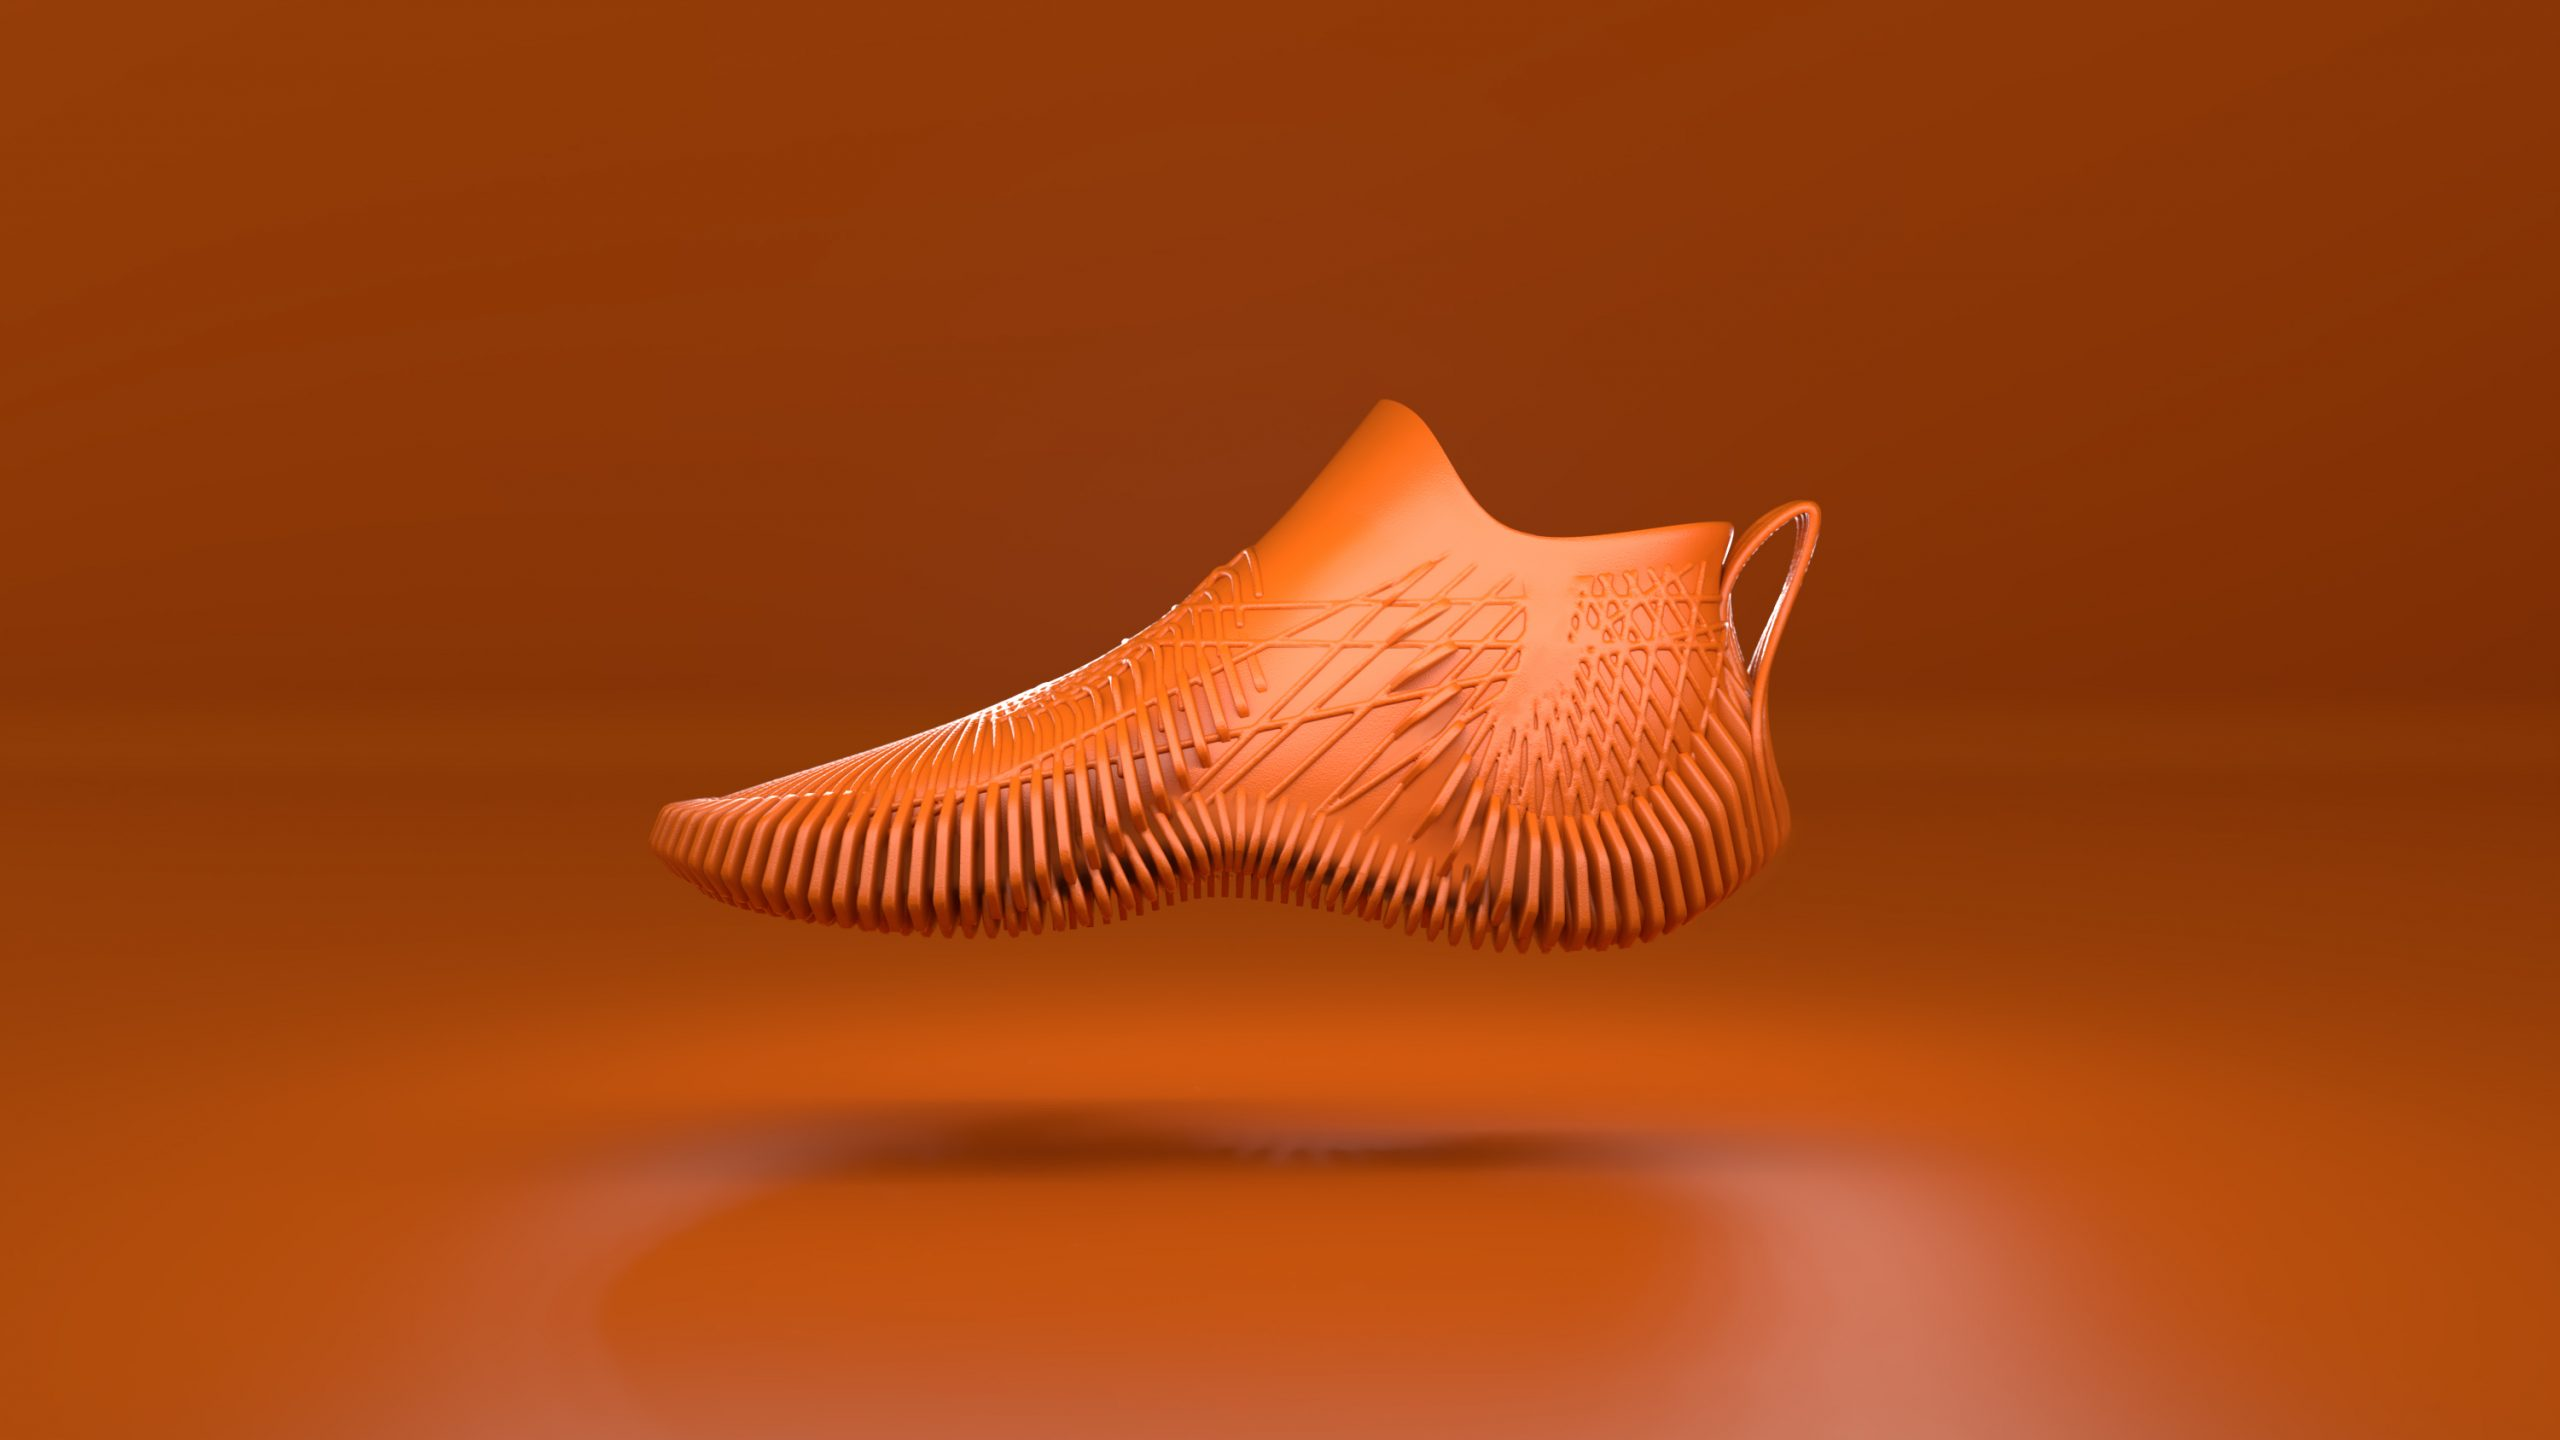 orange parametric shoe with structures on orange background